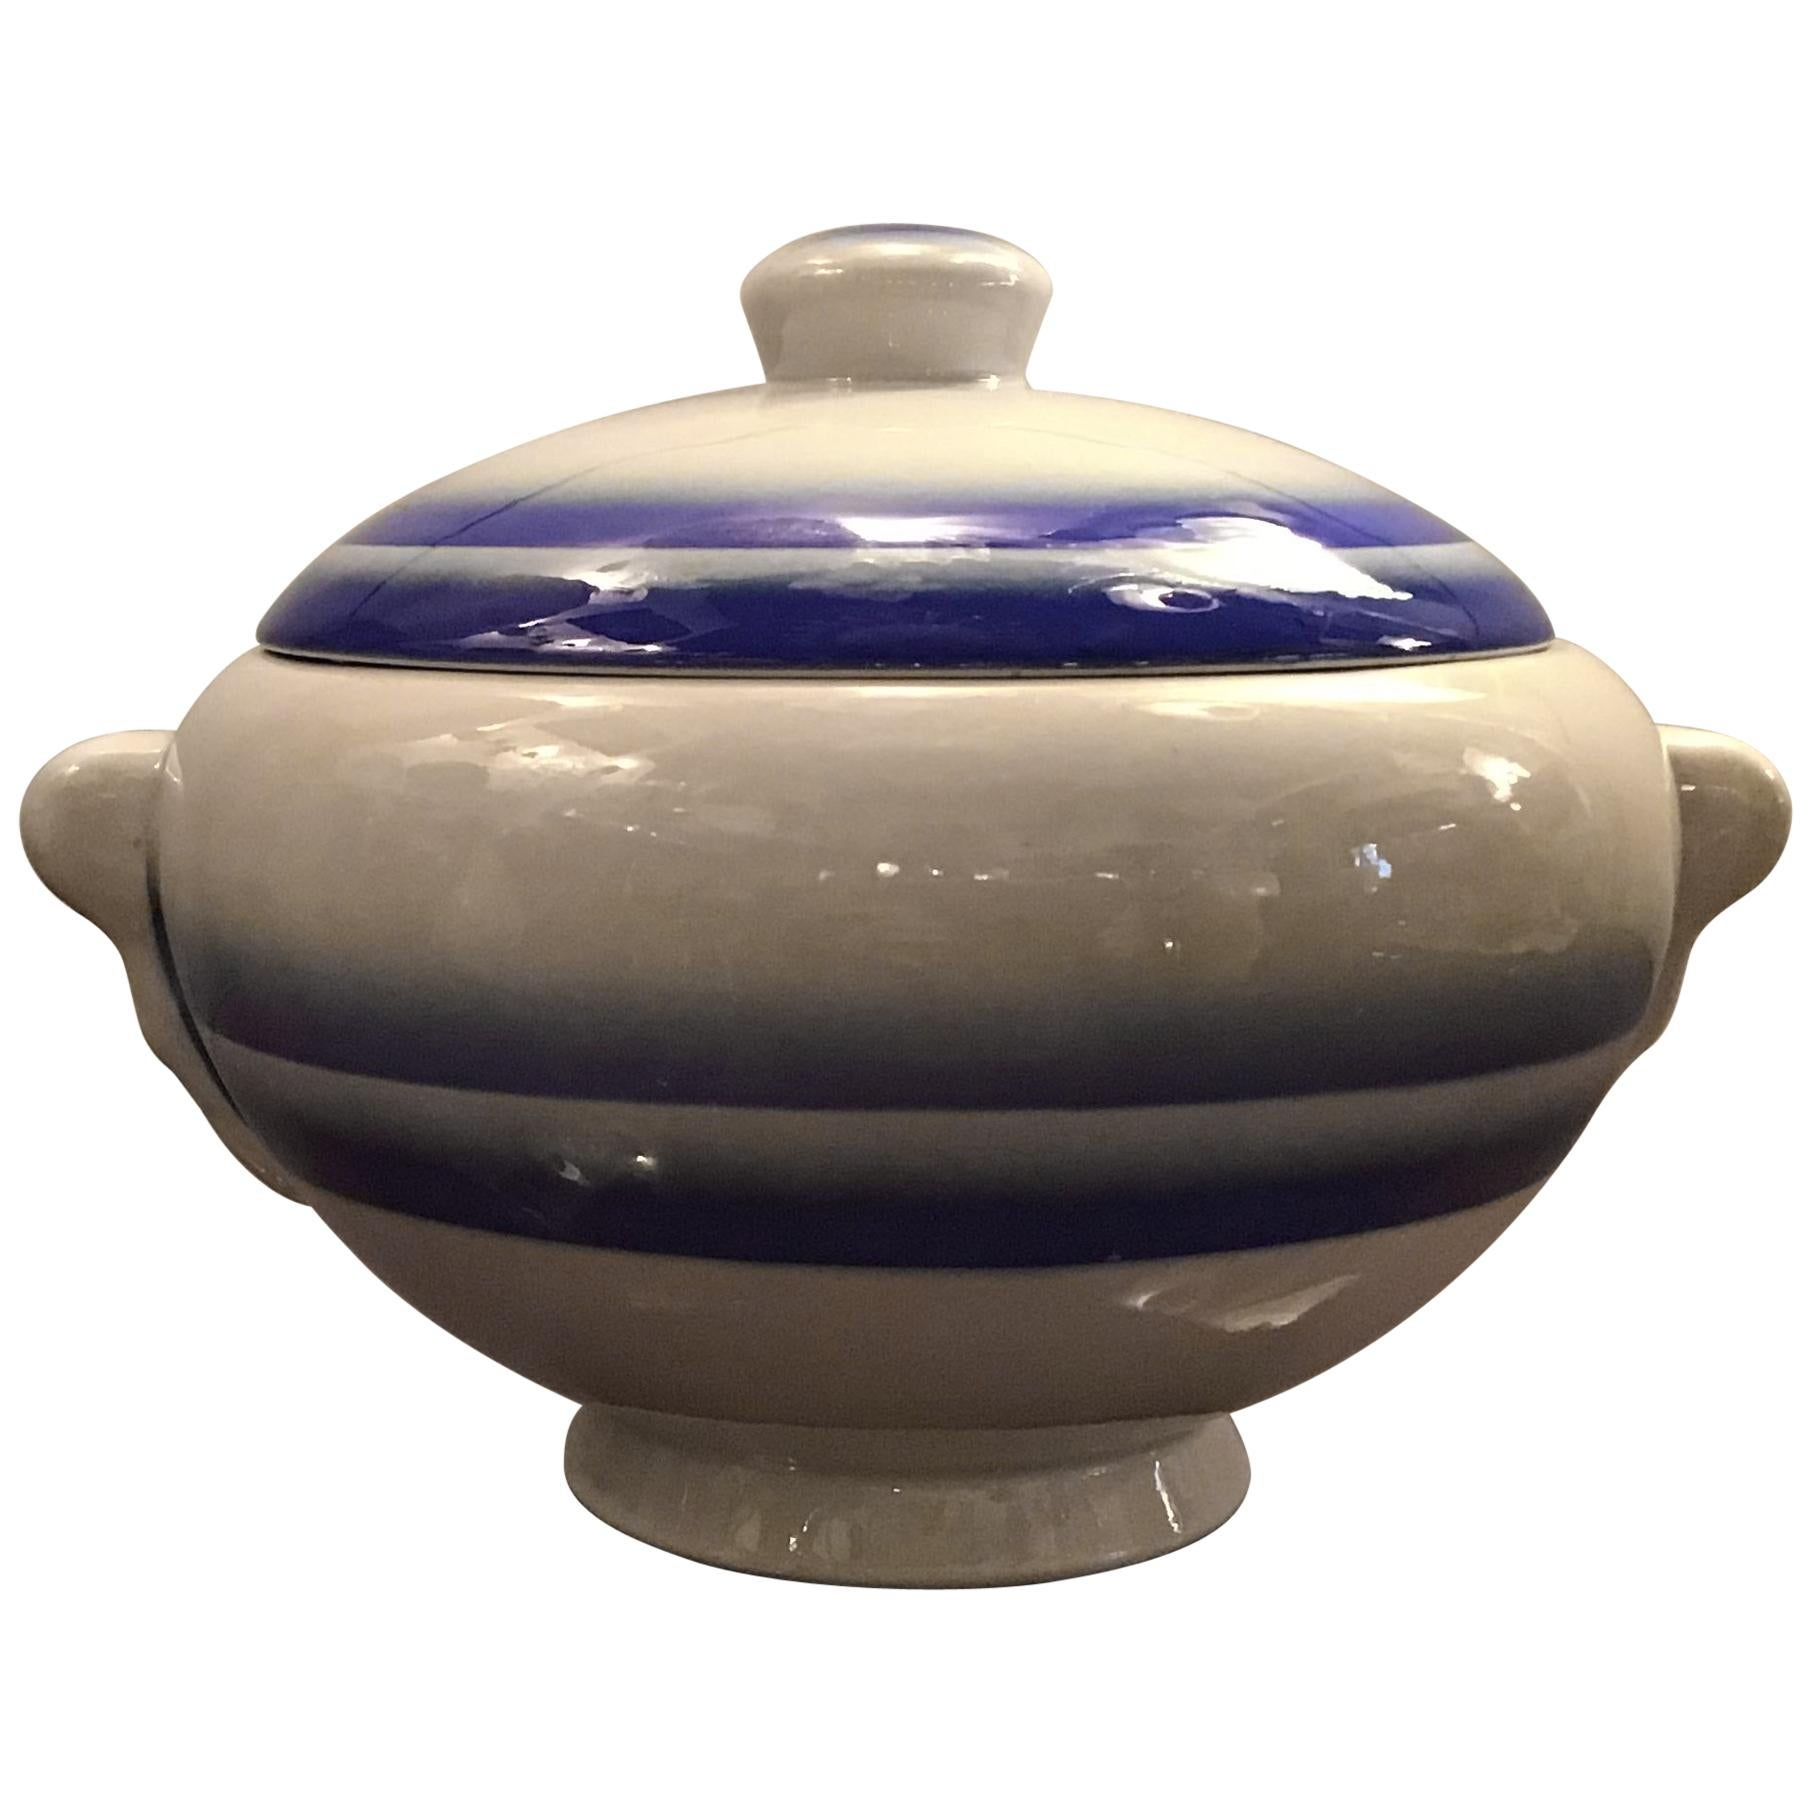 Galvani Pordenone Soup Tureen Centerpiece 1930 Ceramic, Italy